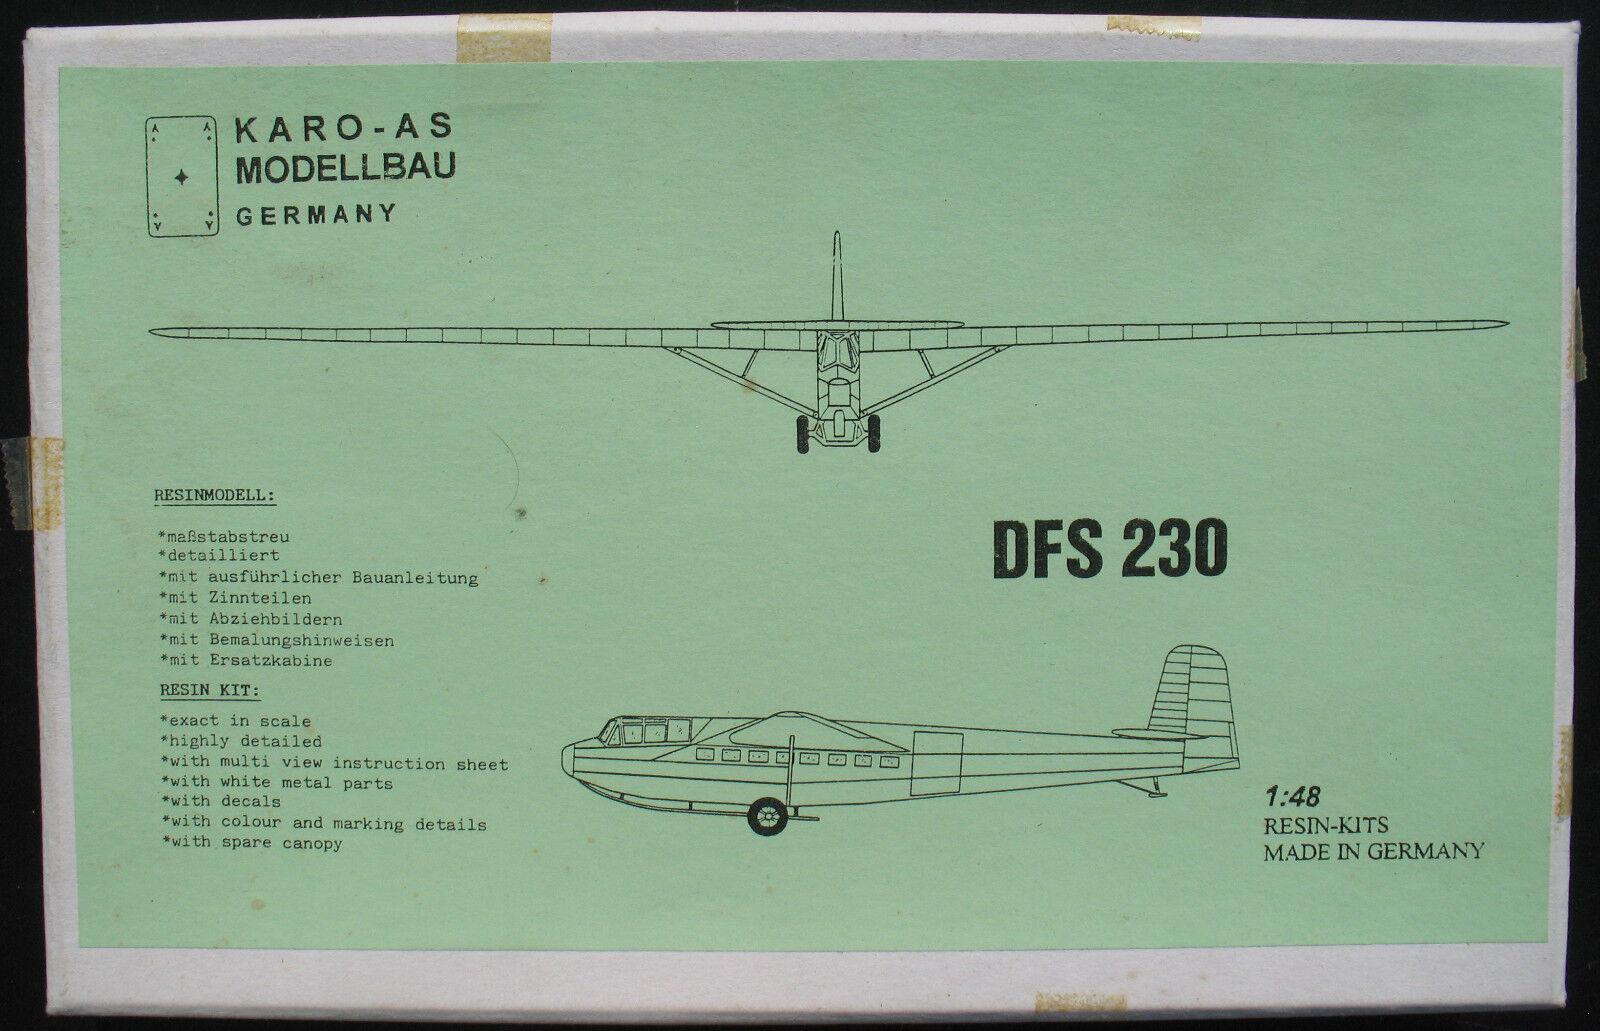 KARO-AS KA. 48-10 - DFS 230 - 1 48 - Resin + Metall - Segelflugzeug Bausatz Kit